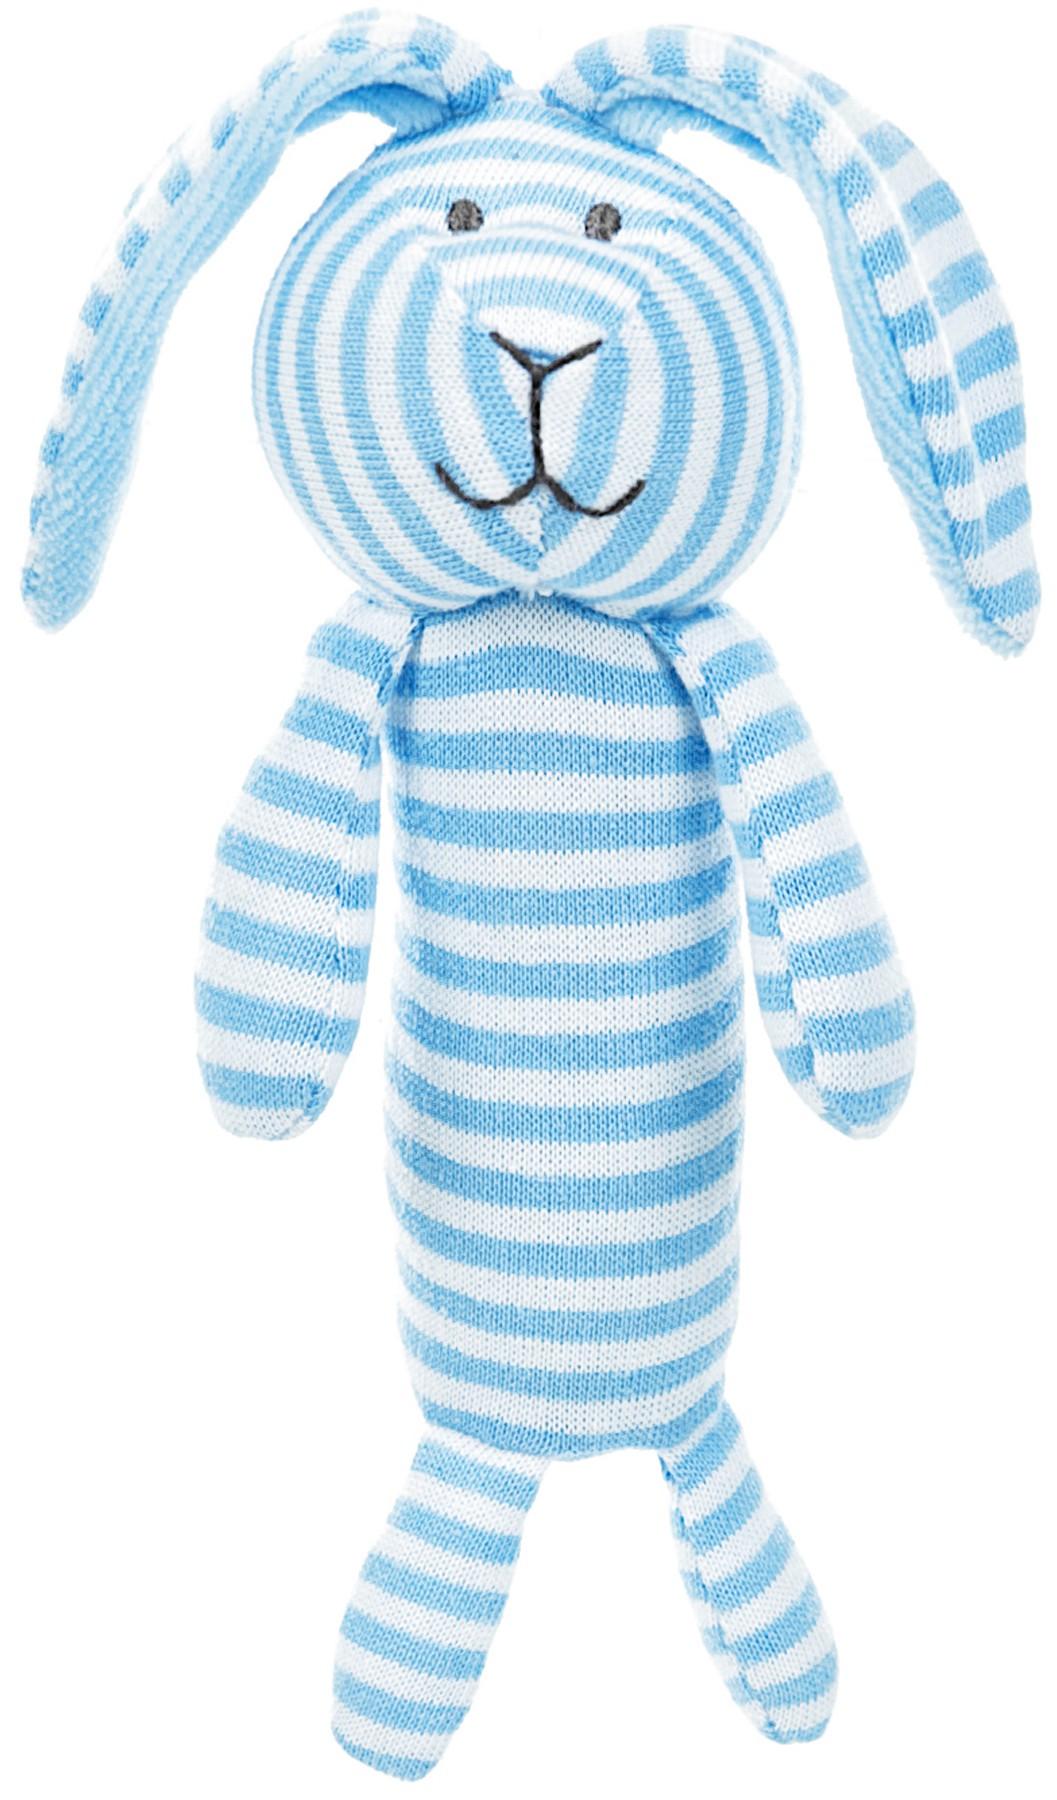 Stripes Skallra, blå, 15cm - Teddykompaniet